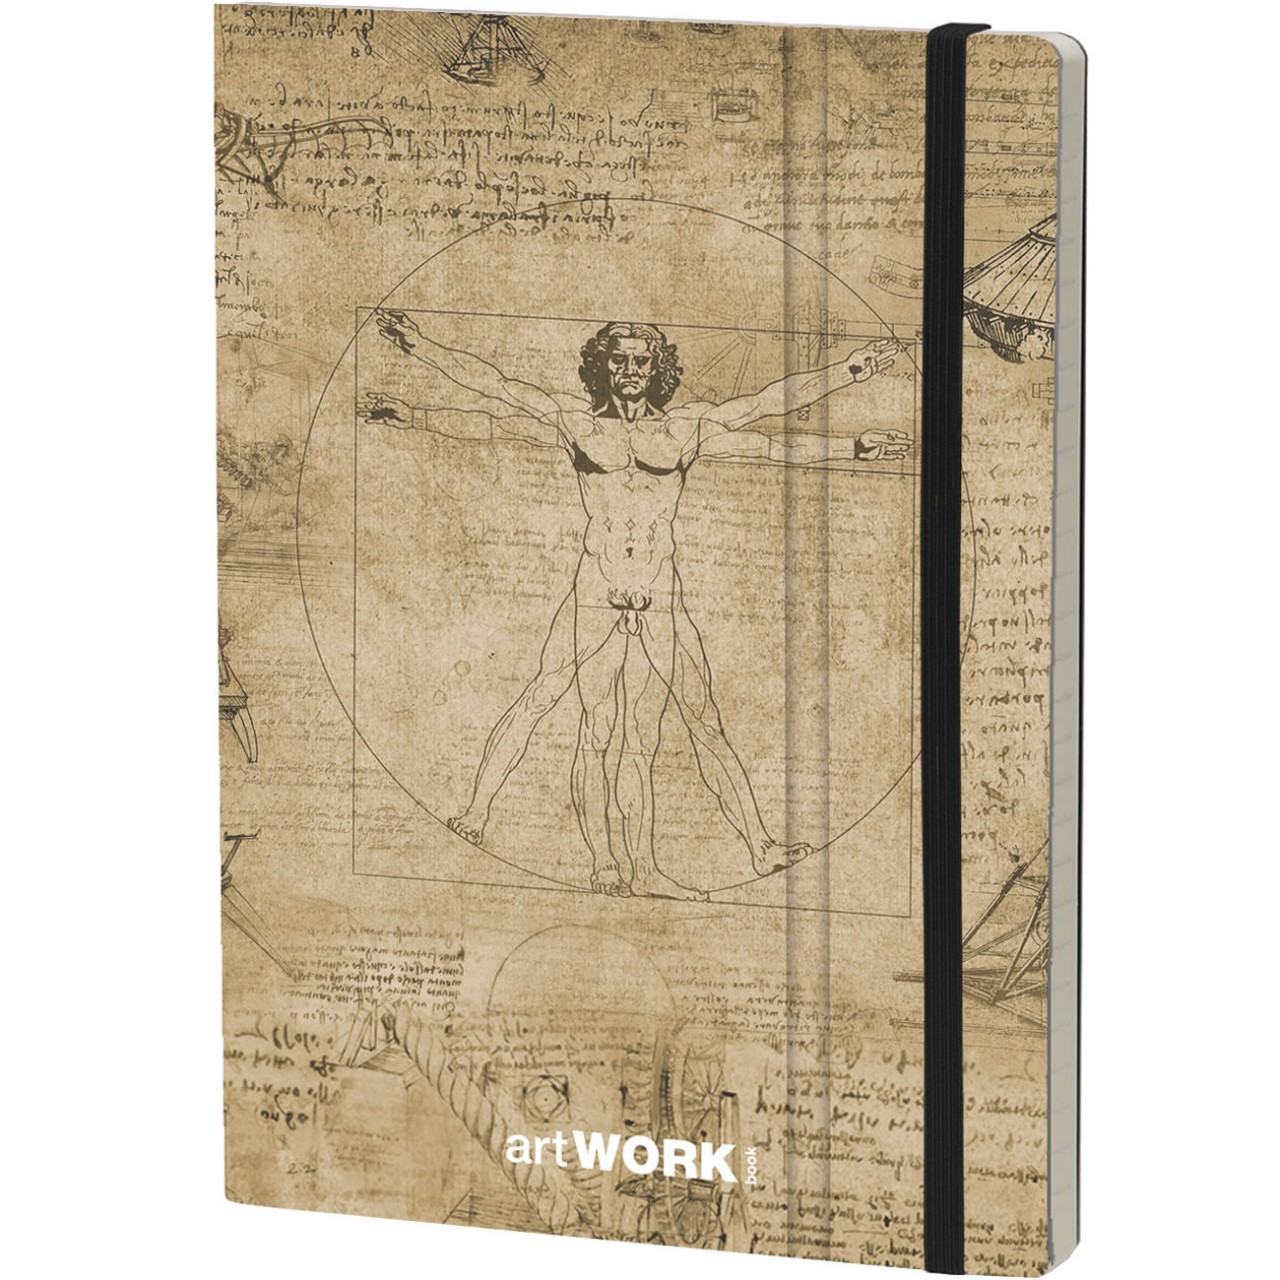 Stifflex Notizbuch ARTWORK BOOK 15 x 21 cm 192 S., LEONARDO